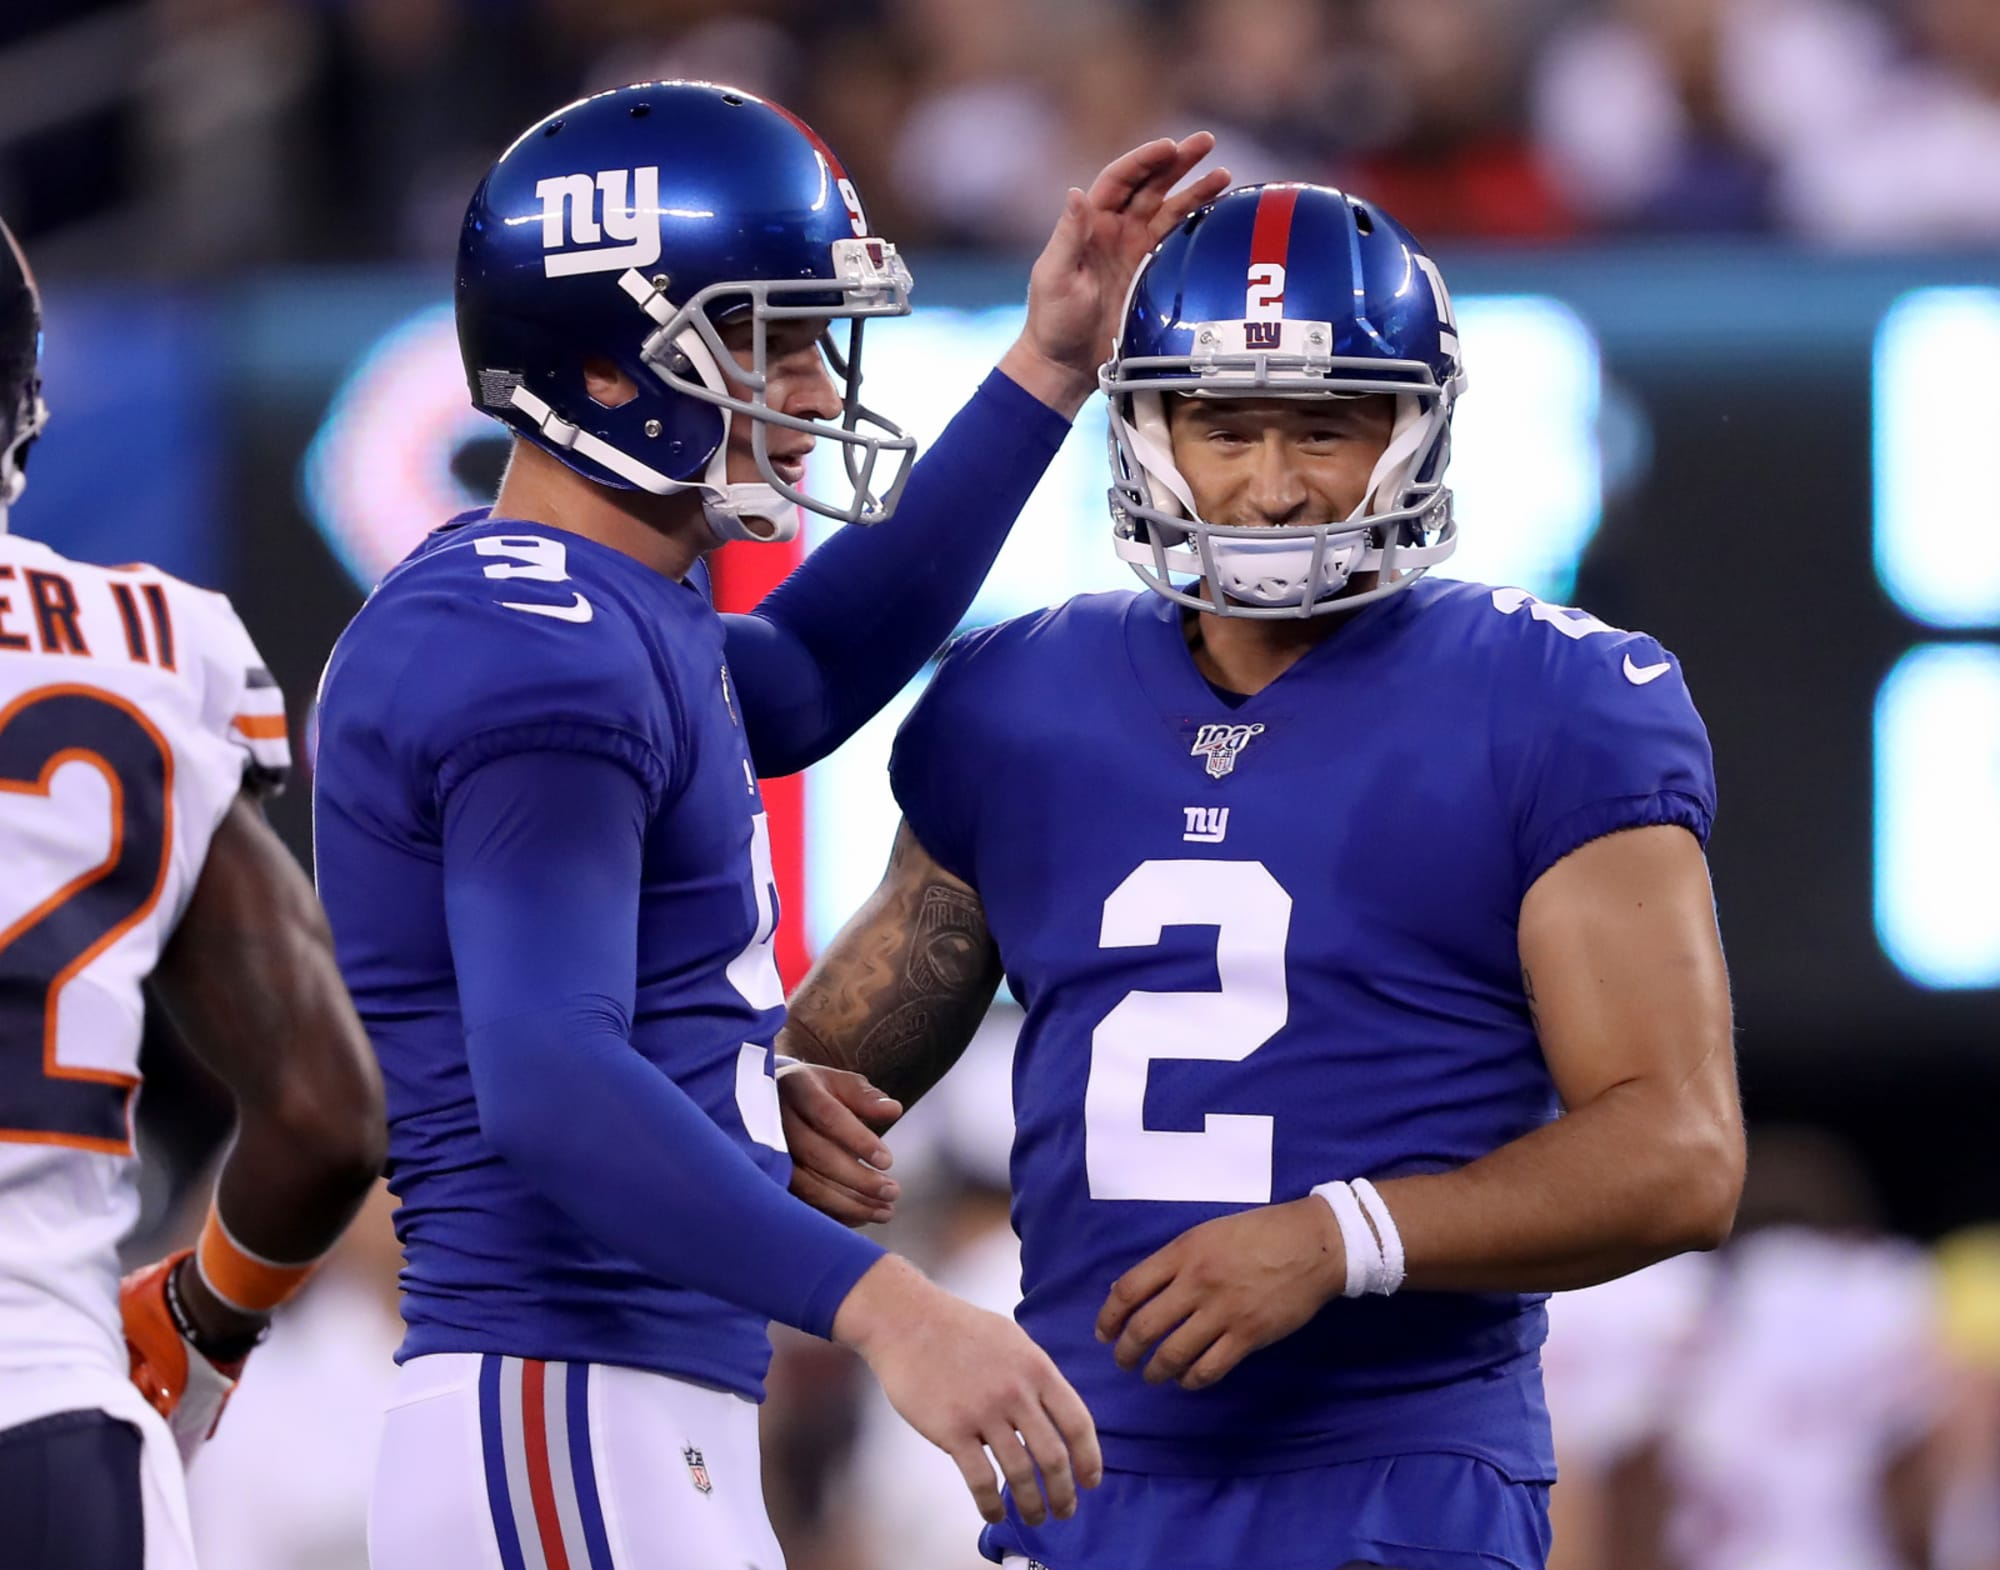 Should the NY Giants retain kicker Aldrick Rosas despite legal ...